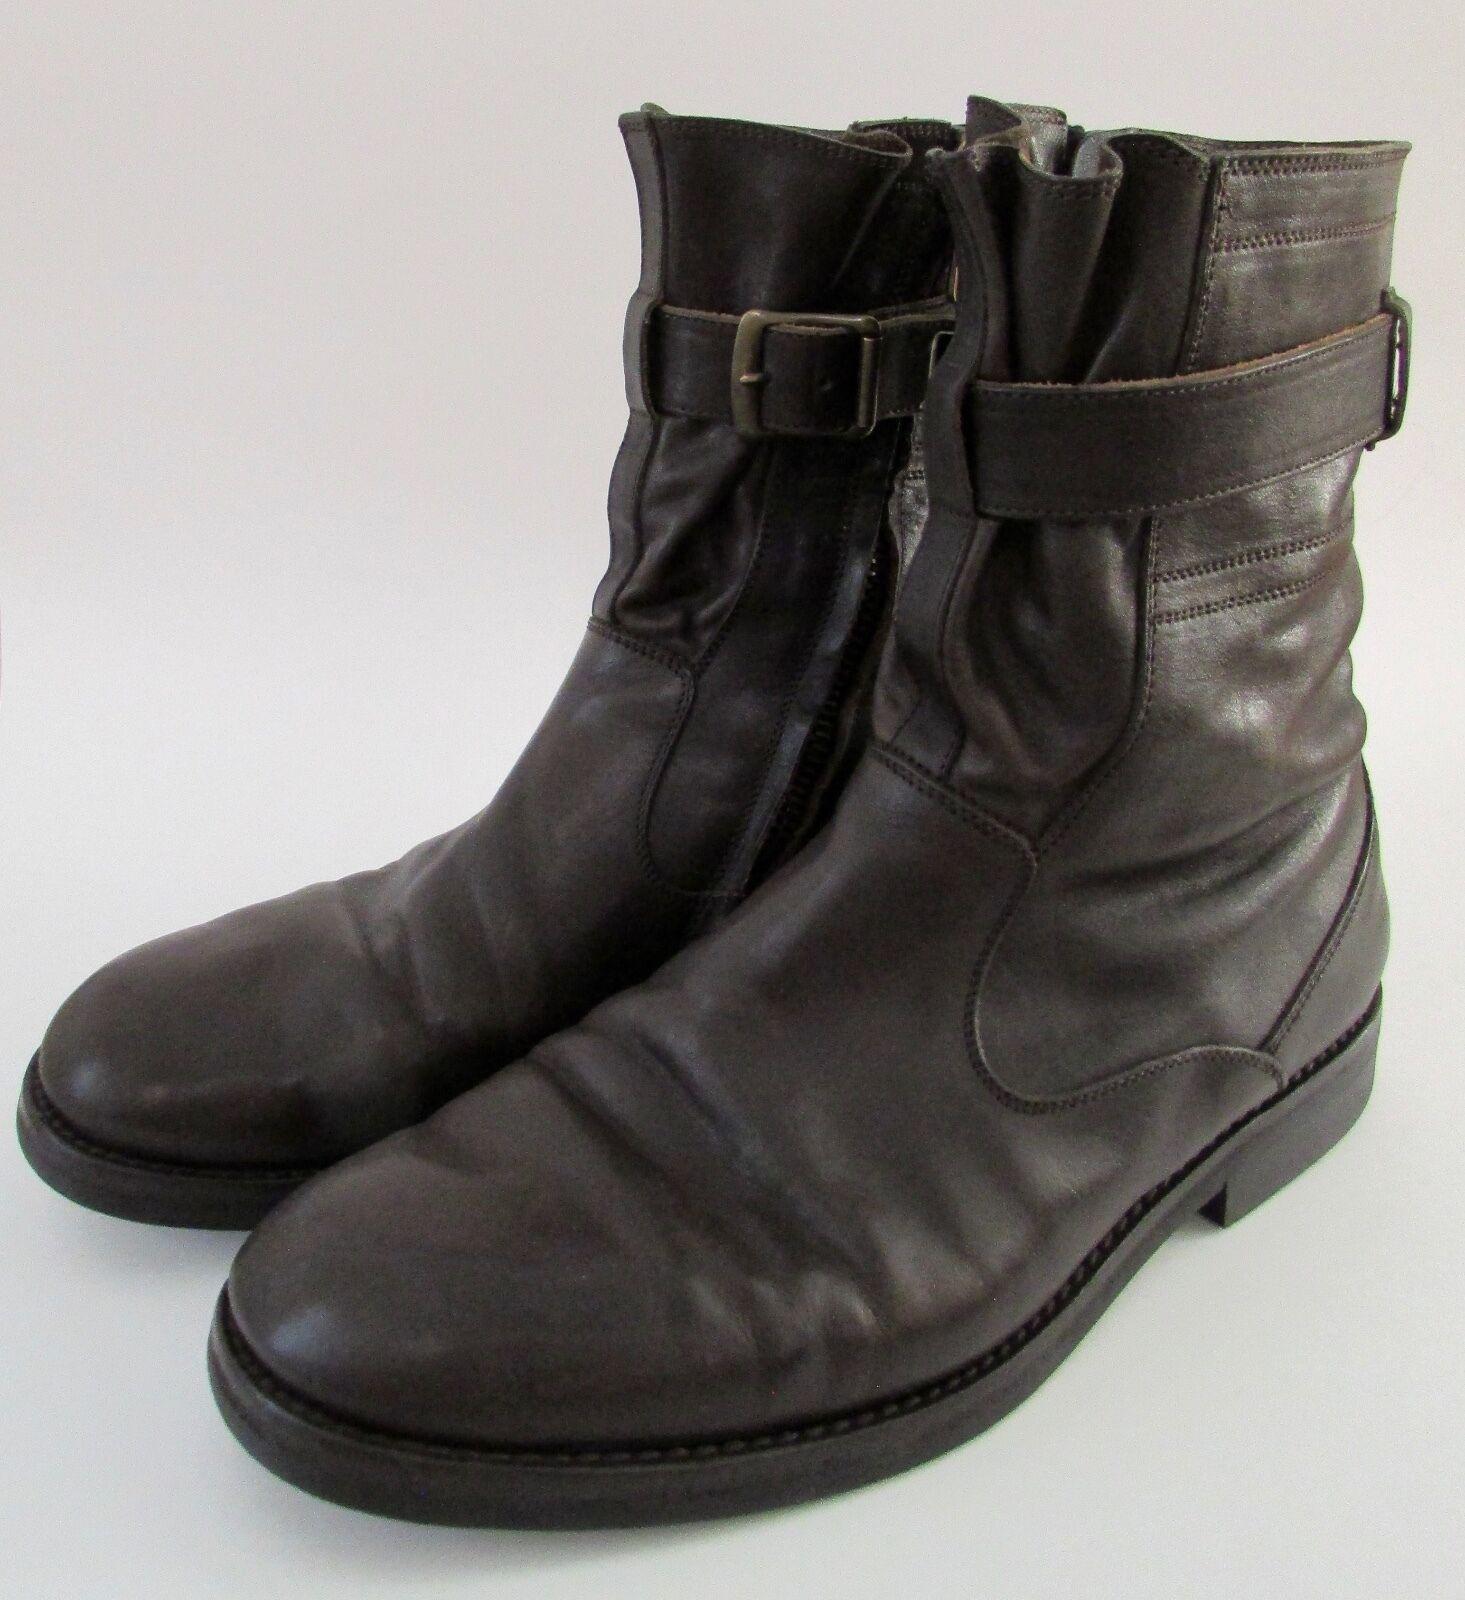 Dries Van Noten Buckle Leather Chelsea Chukka Boots 42  9 Made in